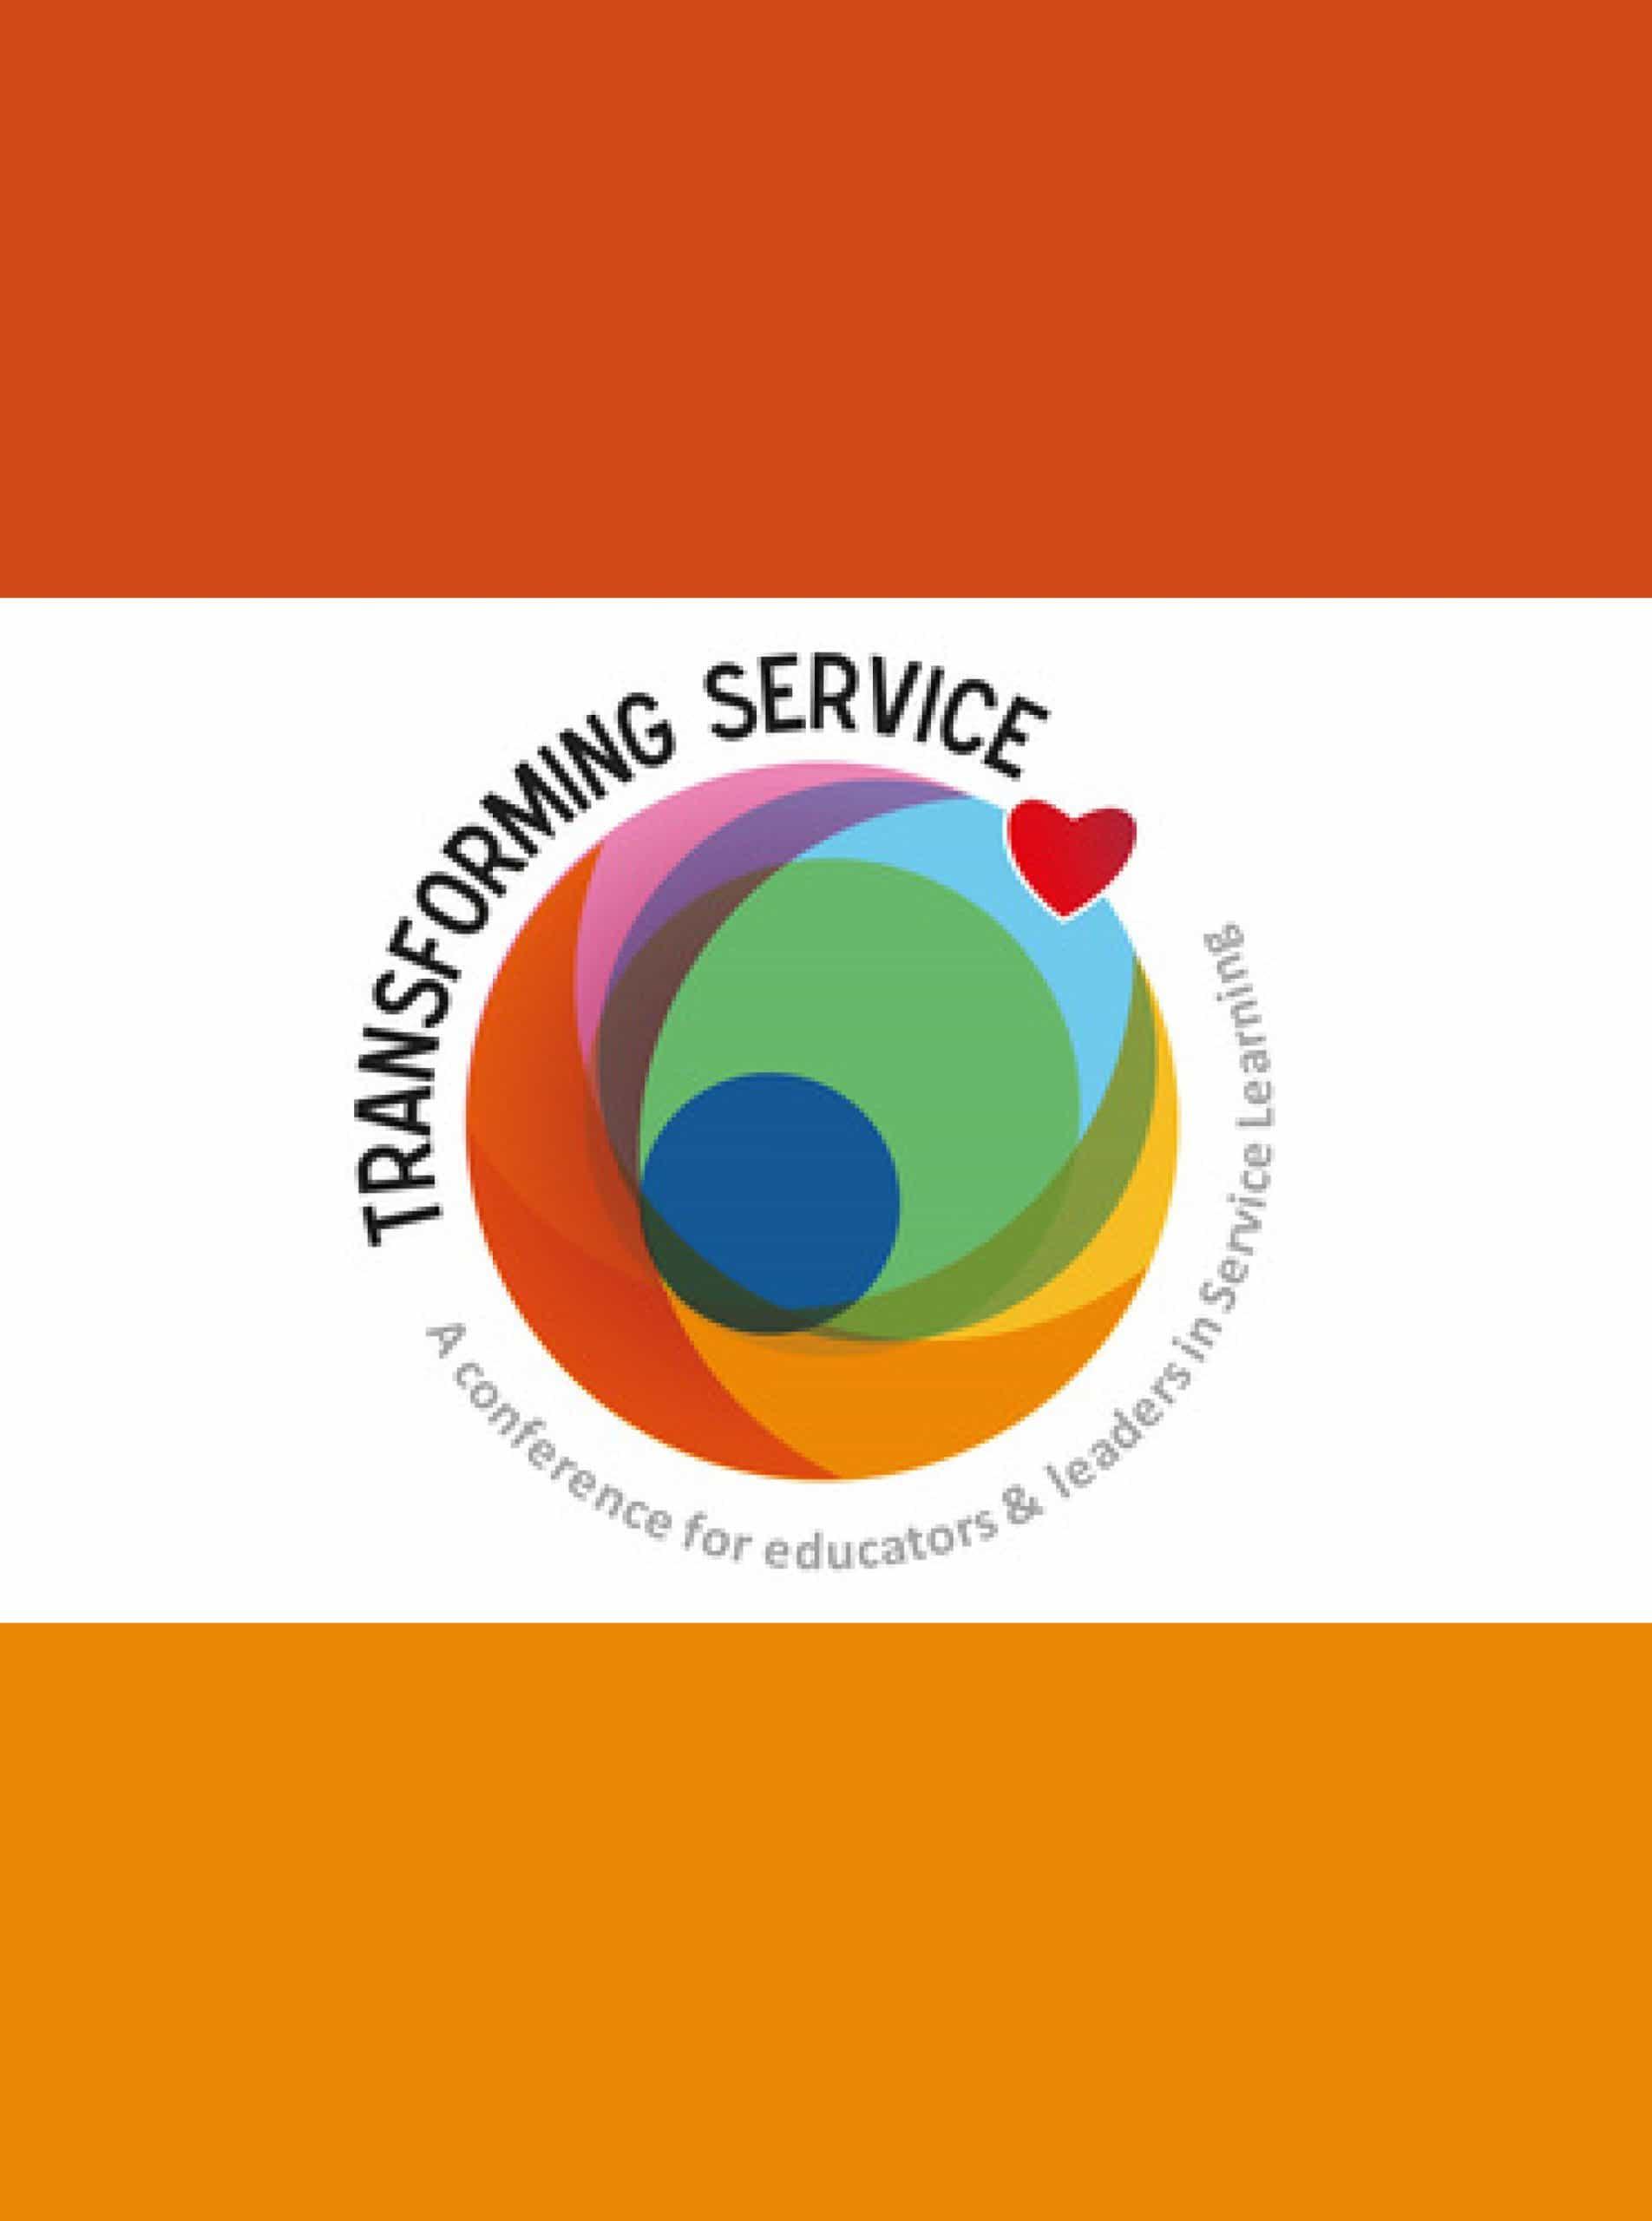 Transforming Service